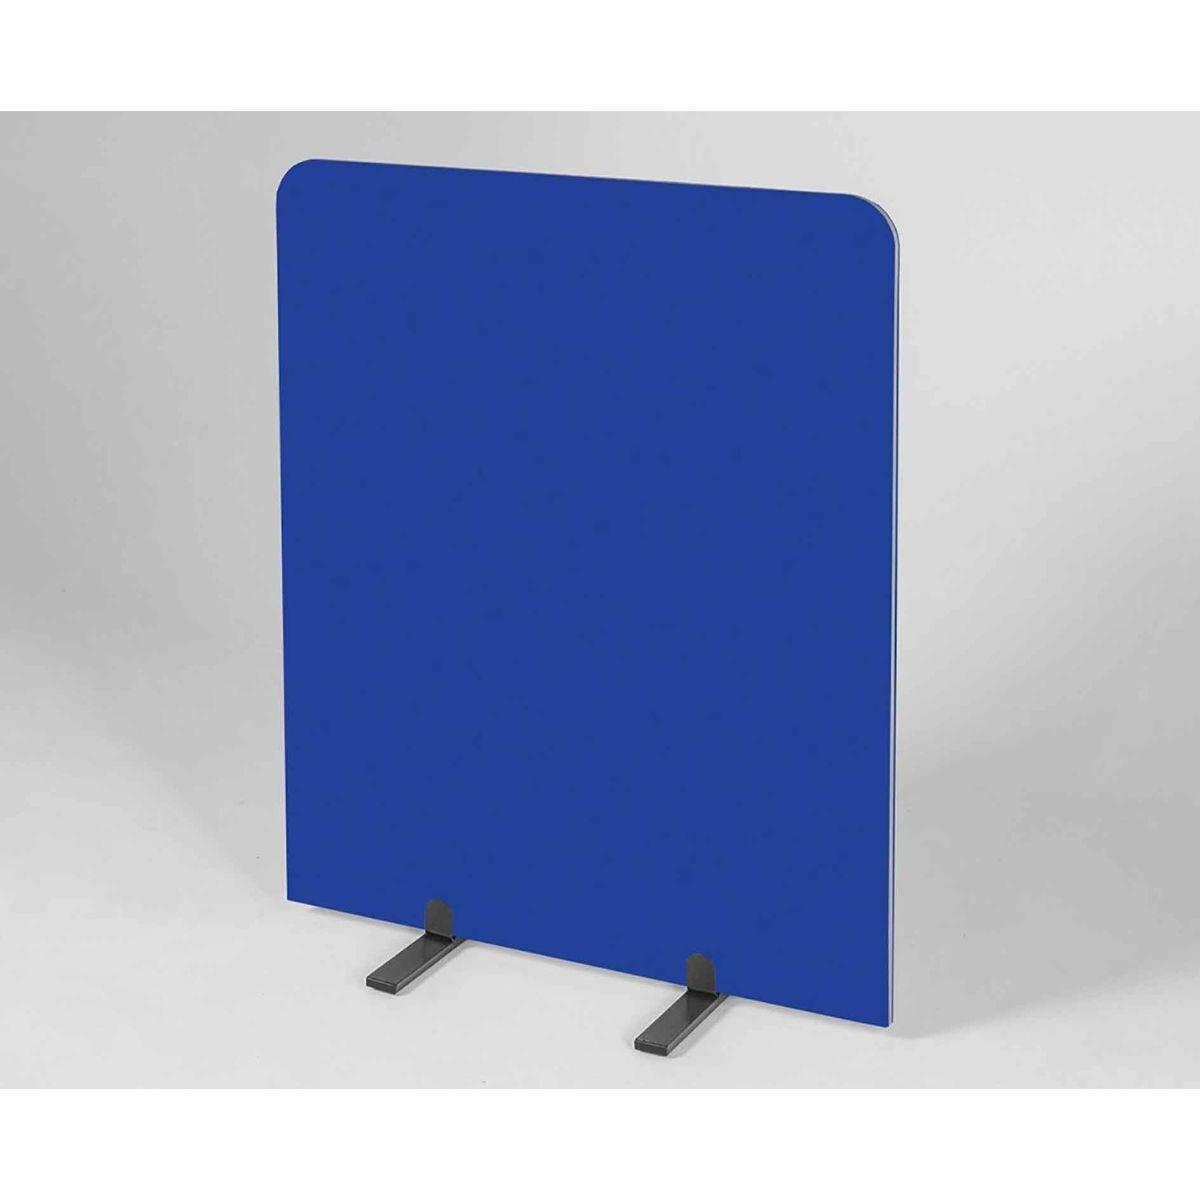 Metroplan BusyScreen Curve Screen 1200 x 1200mm Royal Blue